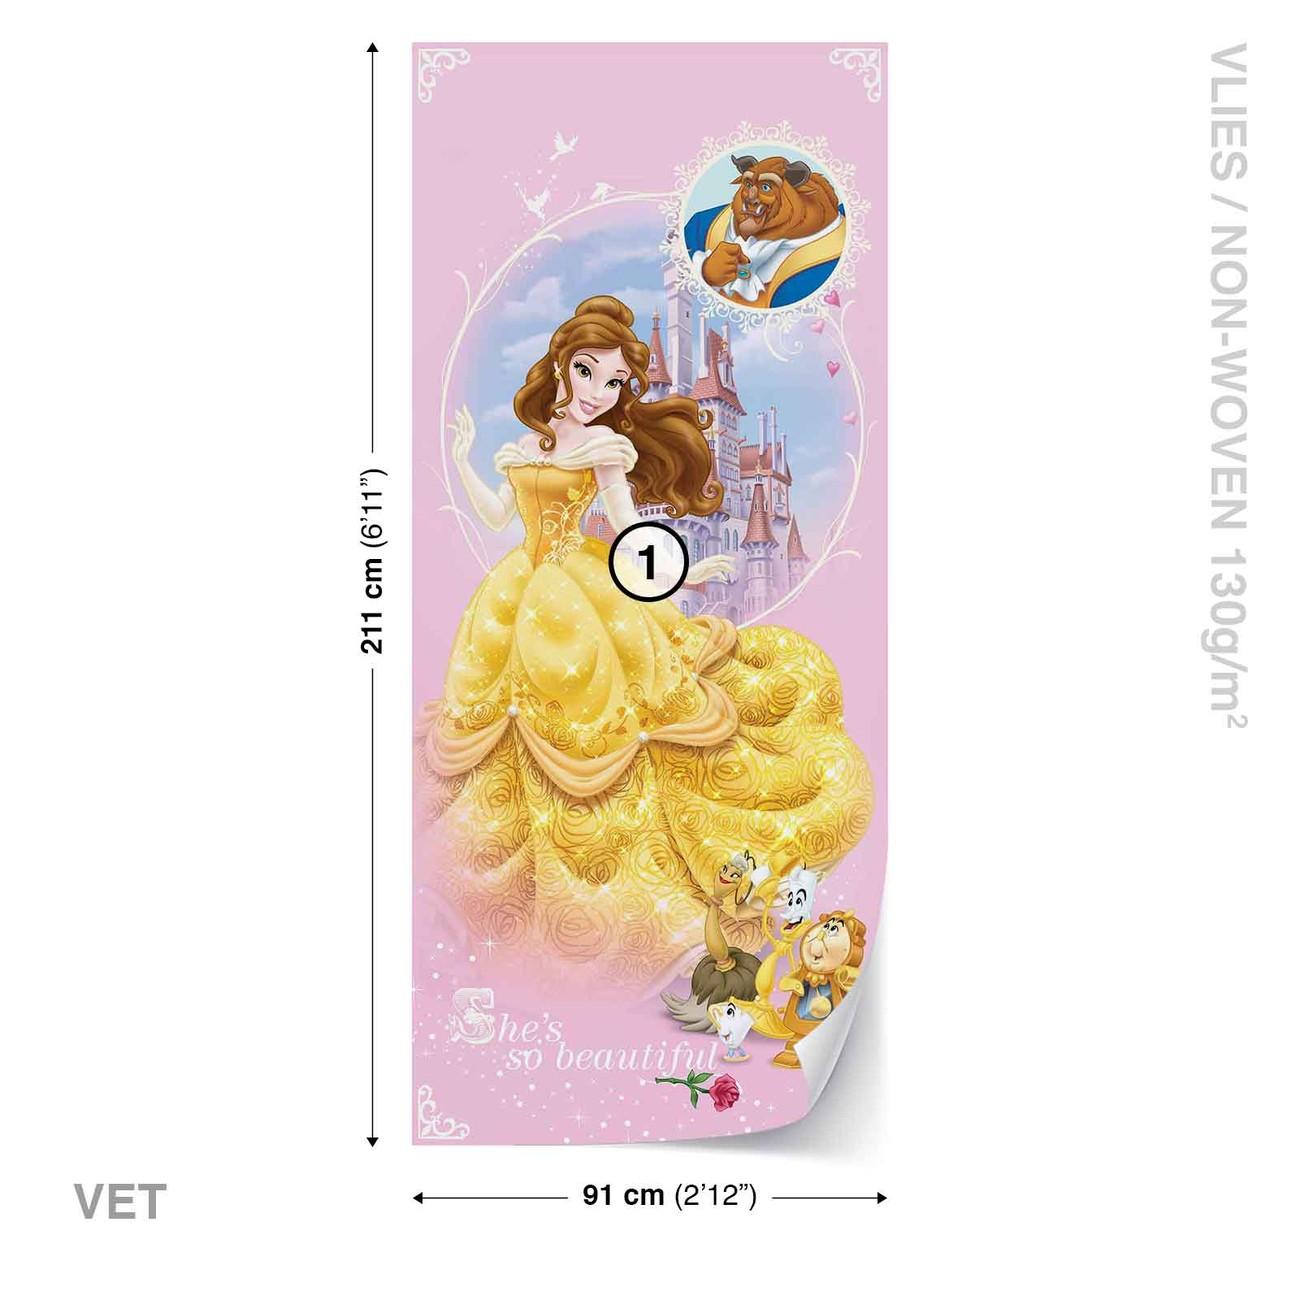 Disney Princesses Beauty Beast Wall Paper Mural   Buy at EuroPosters